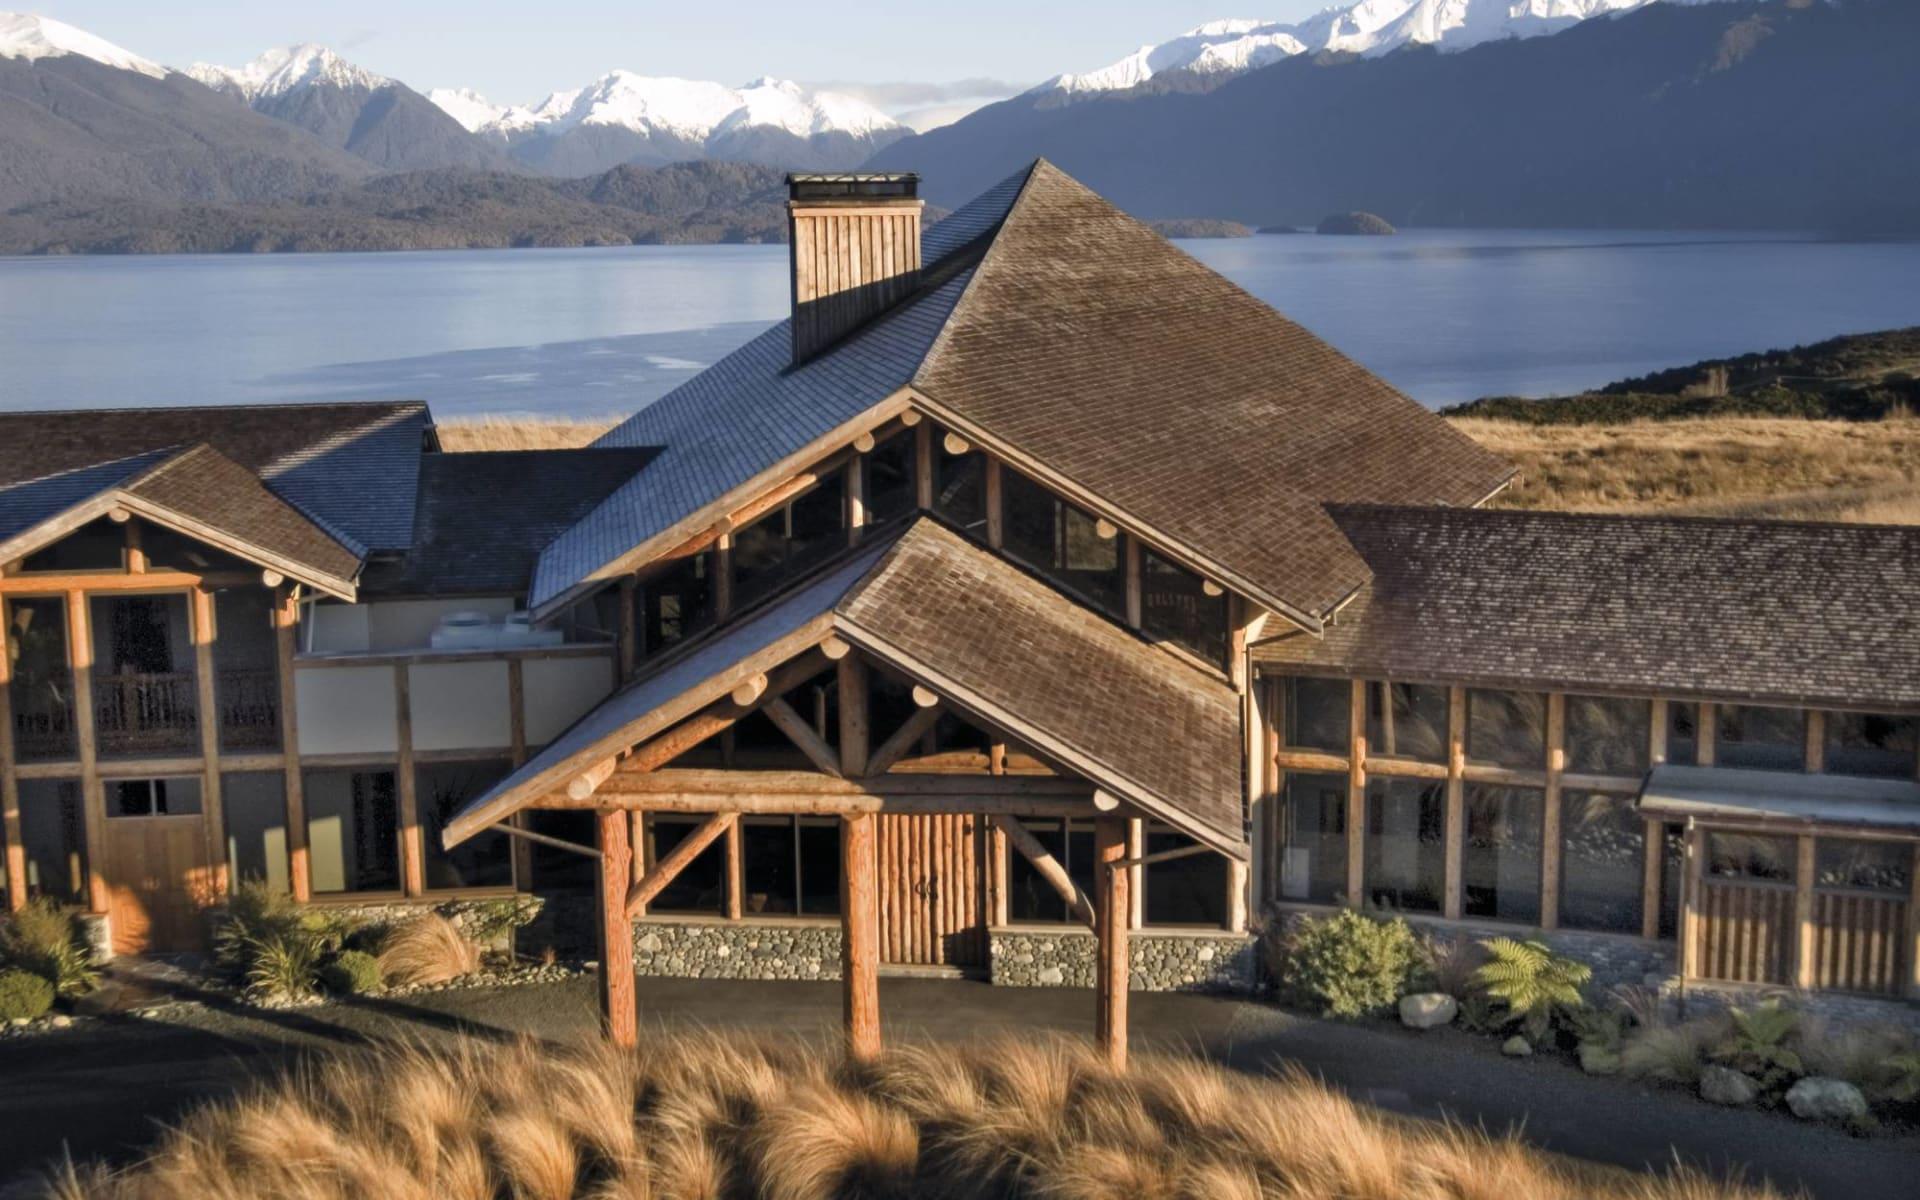 Fiordland Lodge in Te Anau:  Fiordland Lodge - Blick auf den Eingang